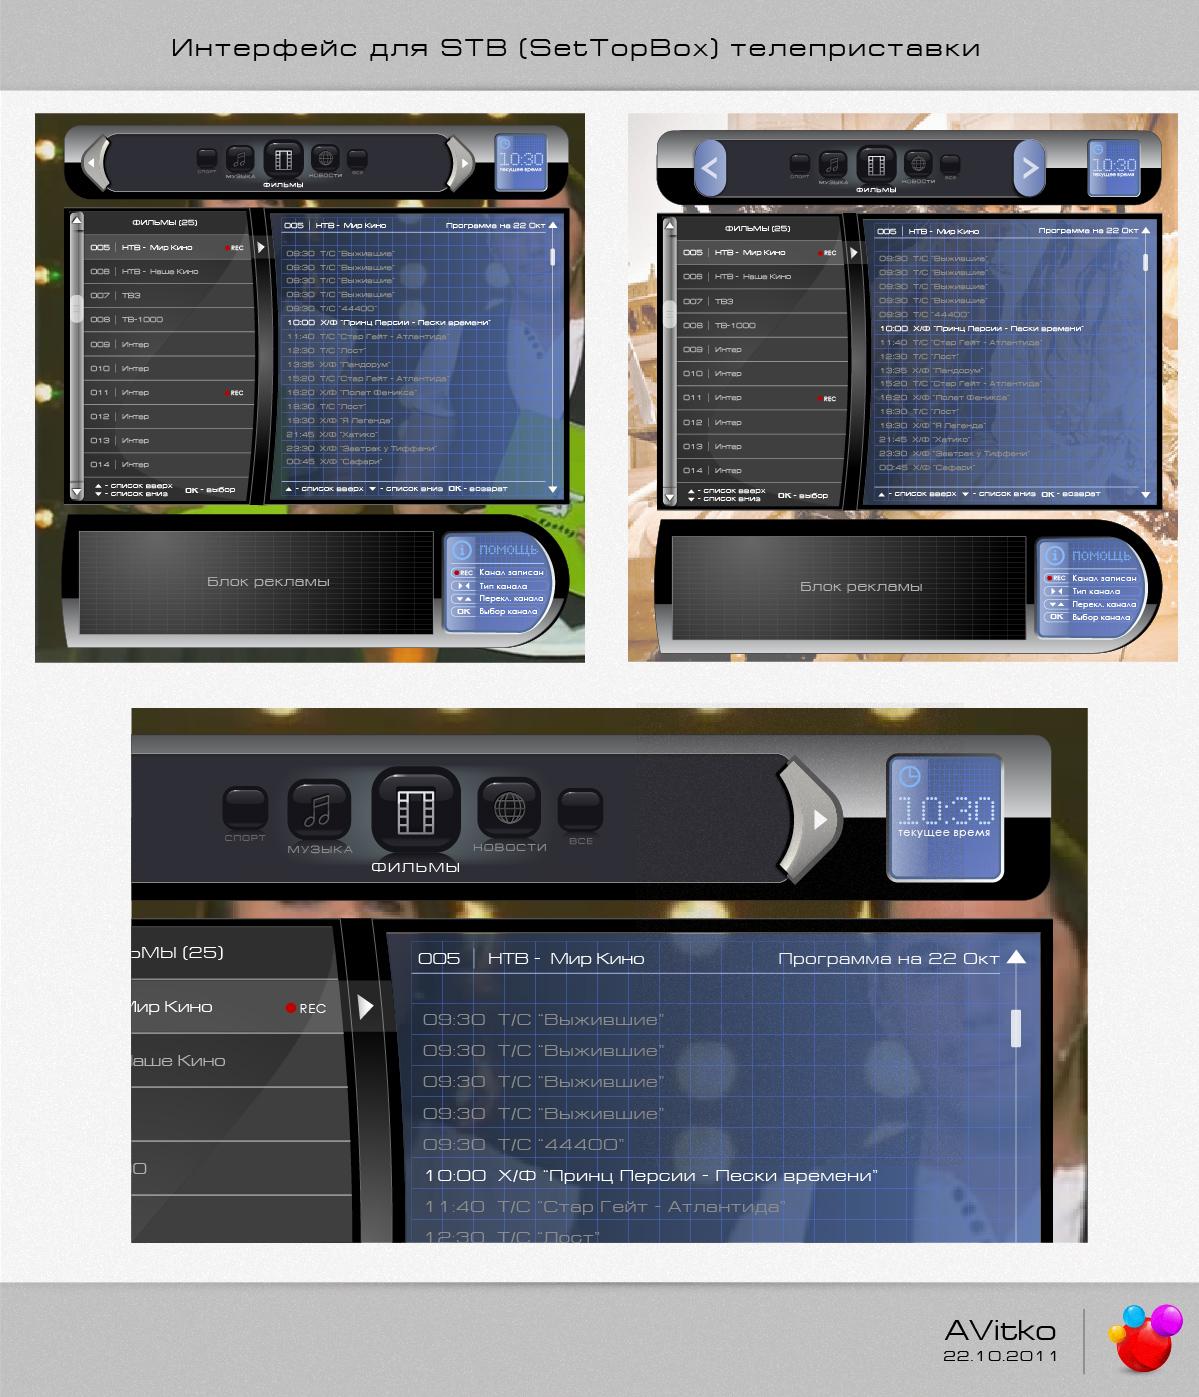 Интерфейс для телеприставки STB (SetTopBox)